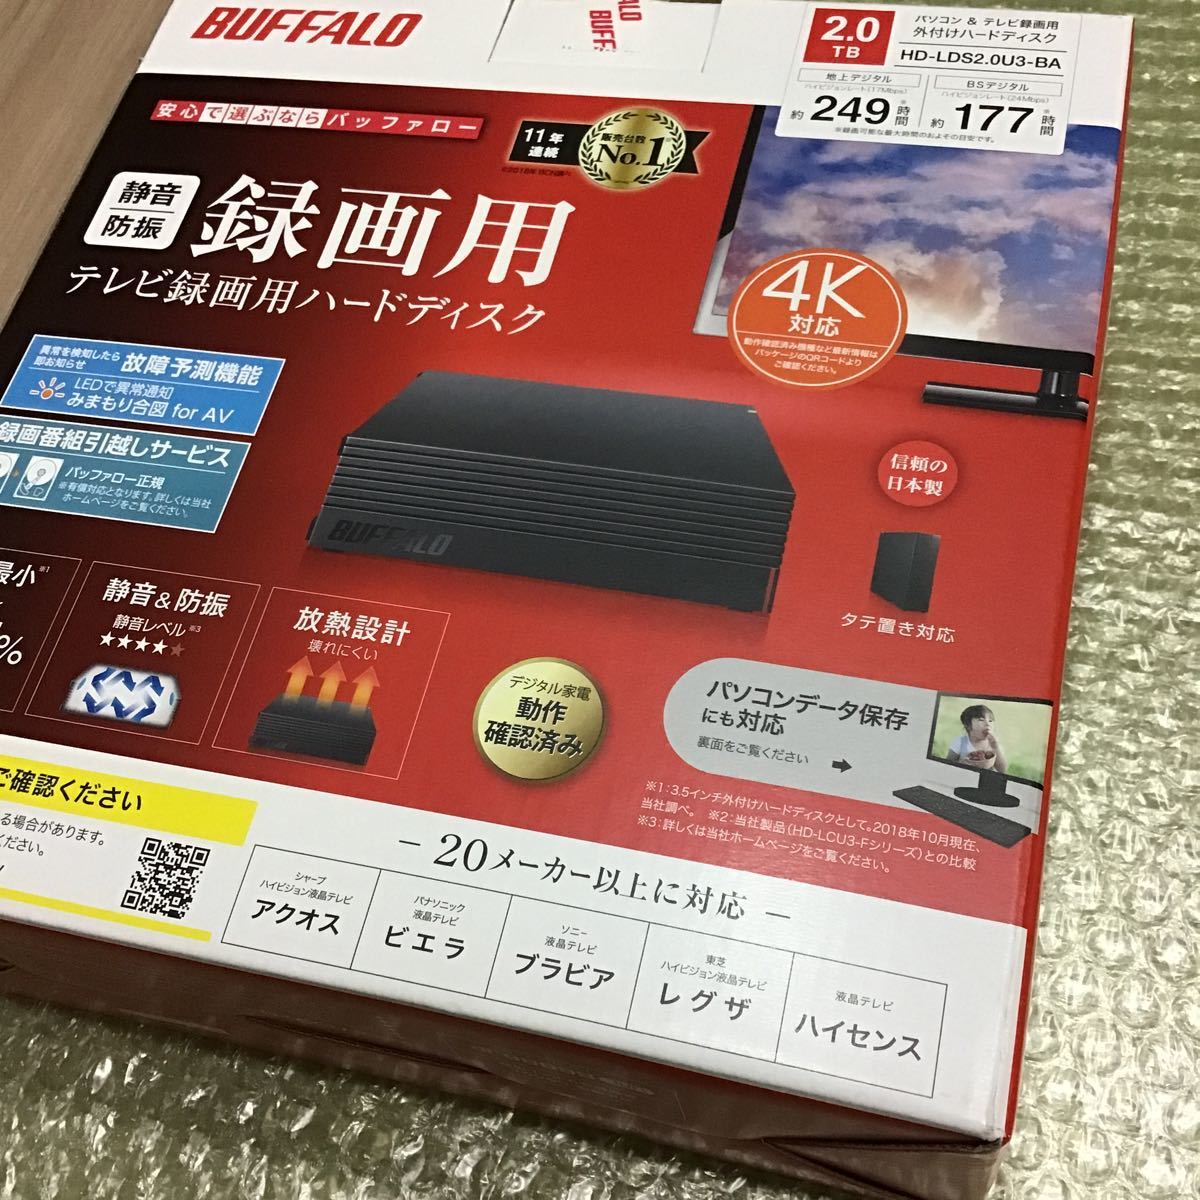 BUFFALO USB3.1(Gen.1)対応 みまもり合図 for AV対応 外付けHDD 2TB ブラック HD-LDS2.0